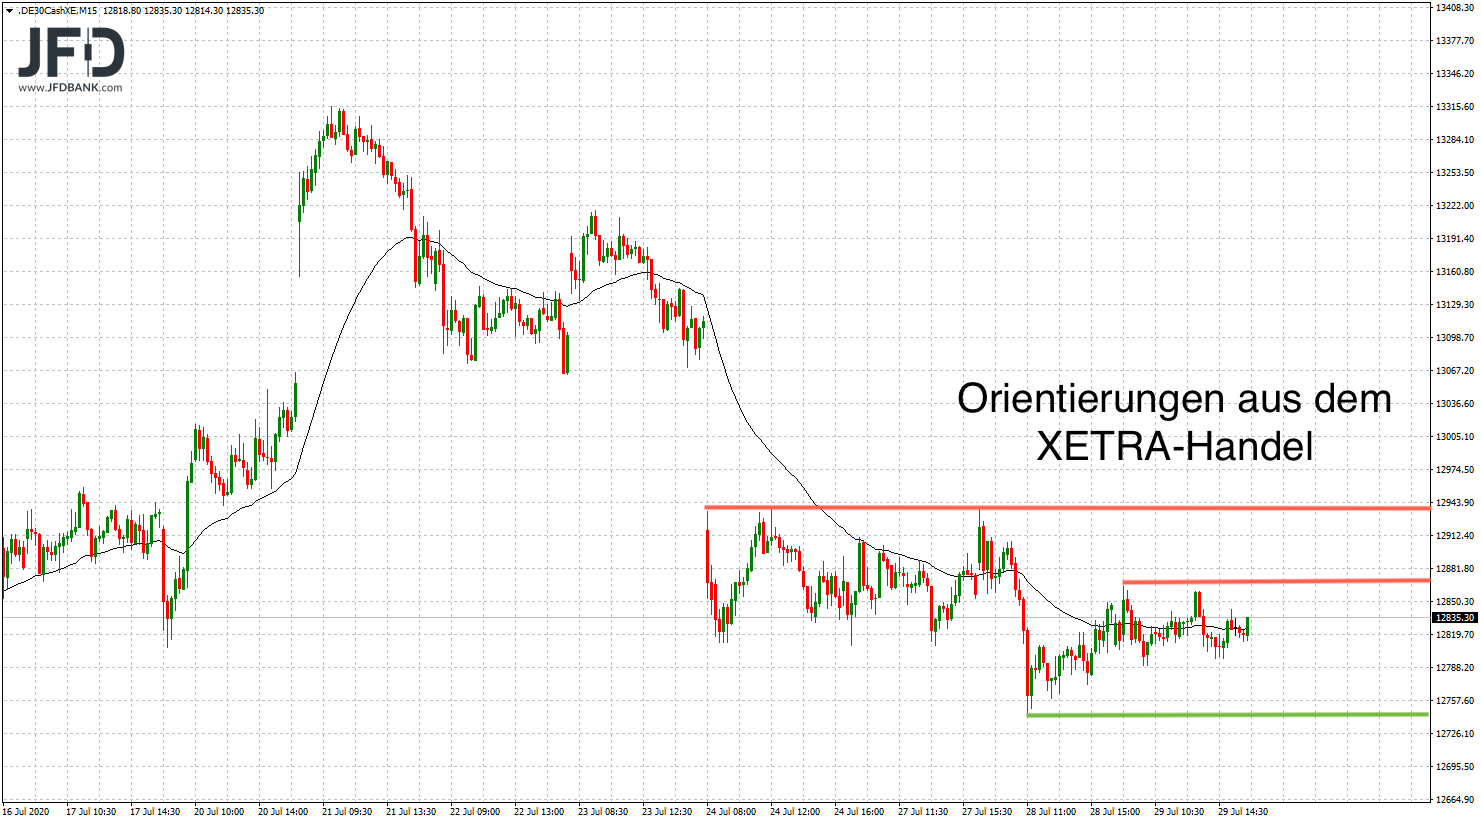 DAX-Signale-nach-der-FED-Sitzung-Kommentar-JFD-Bank-GodmodeTrader.de-4